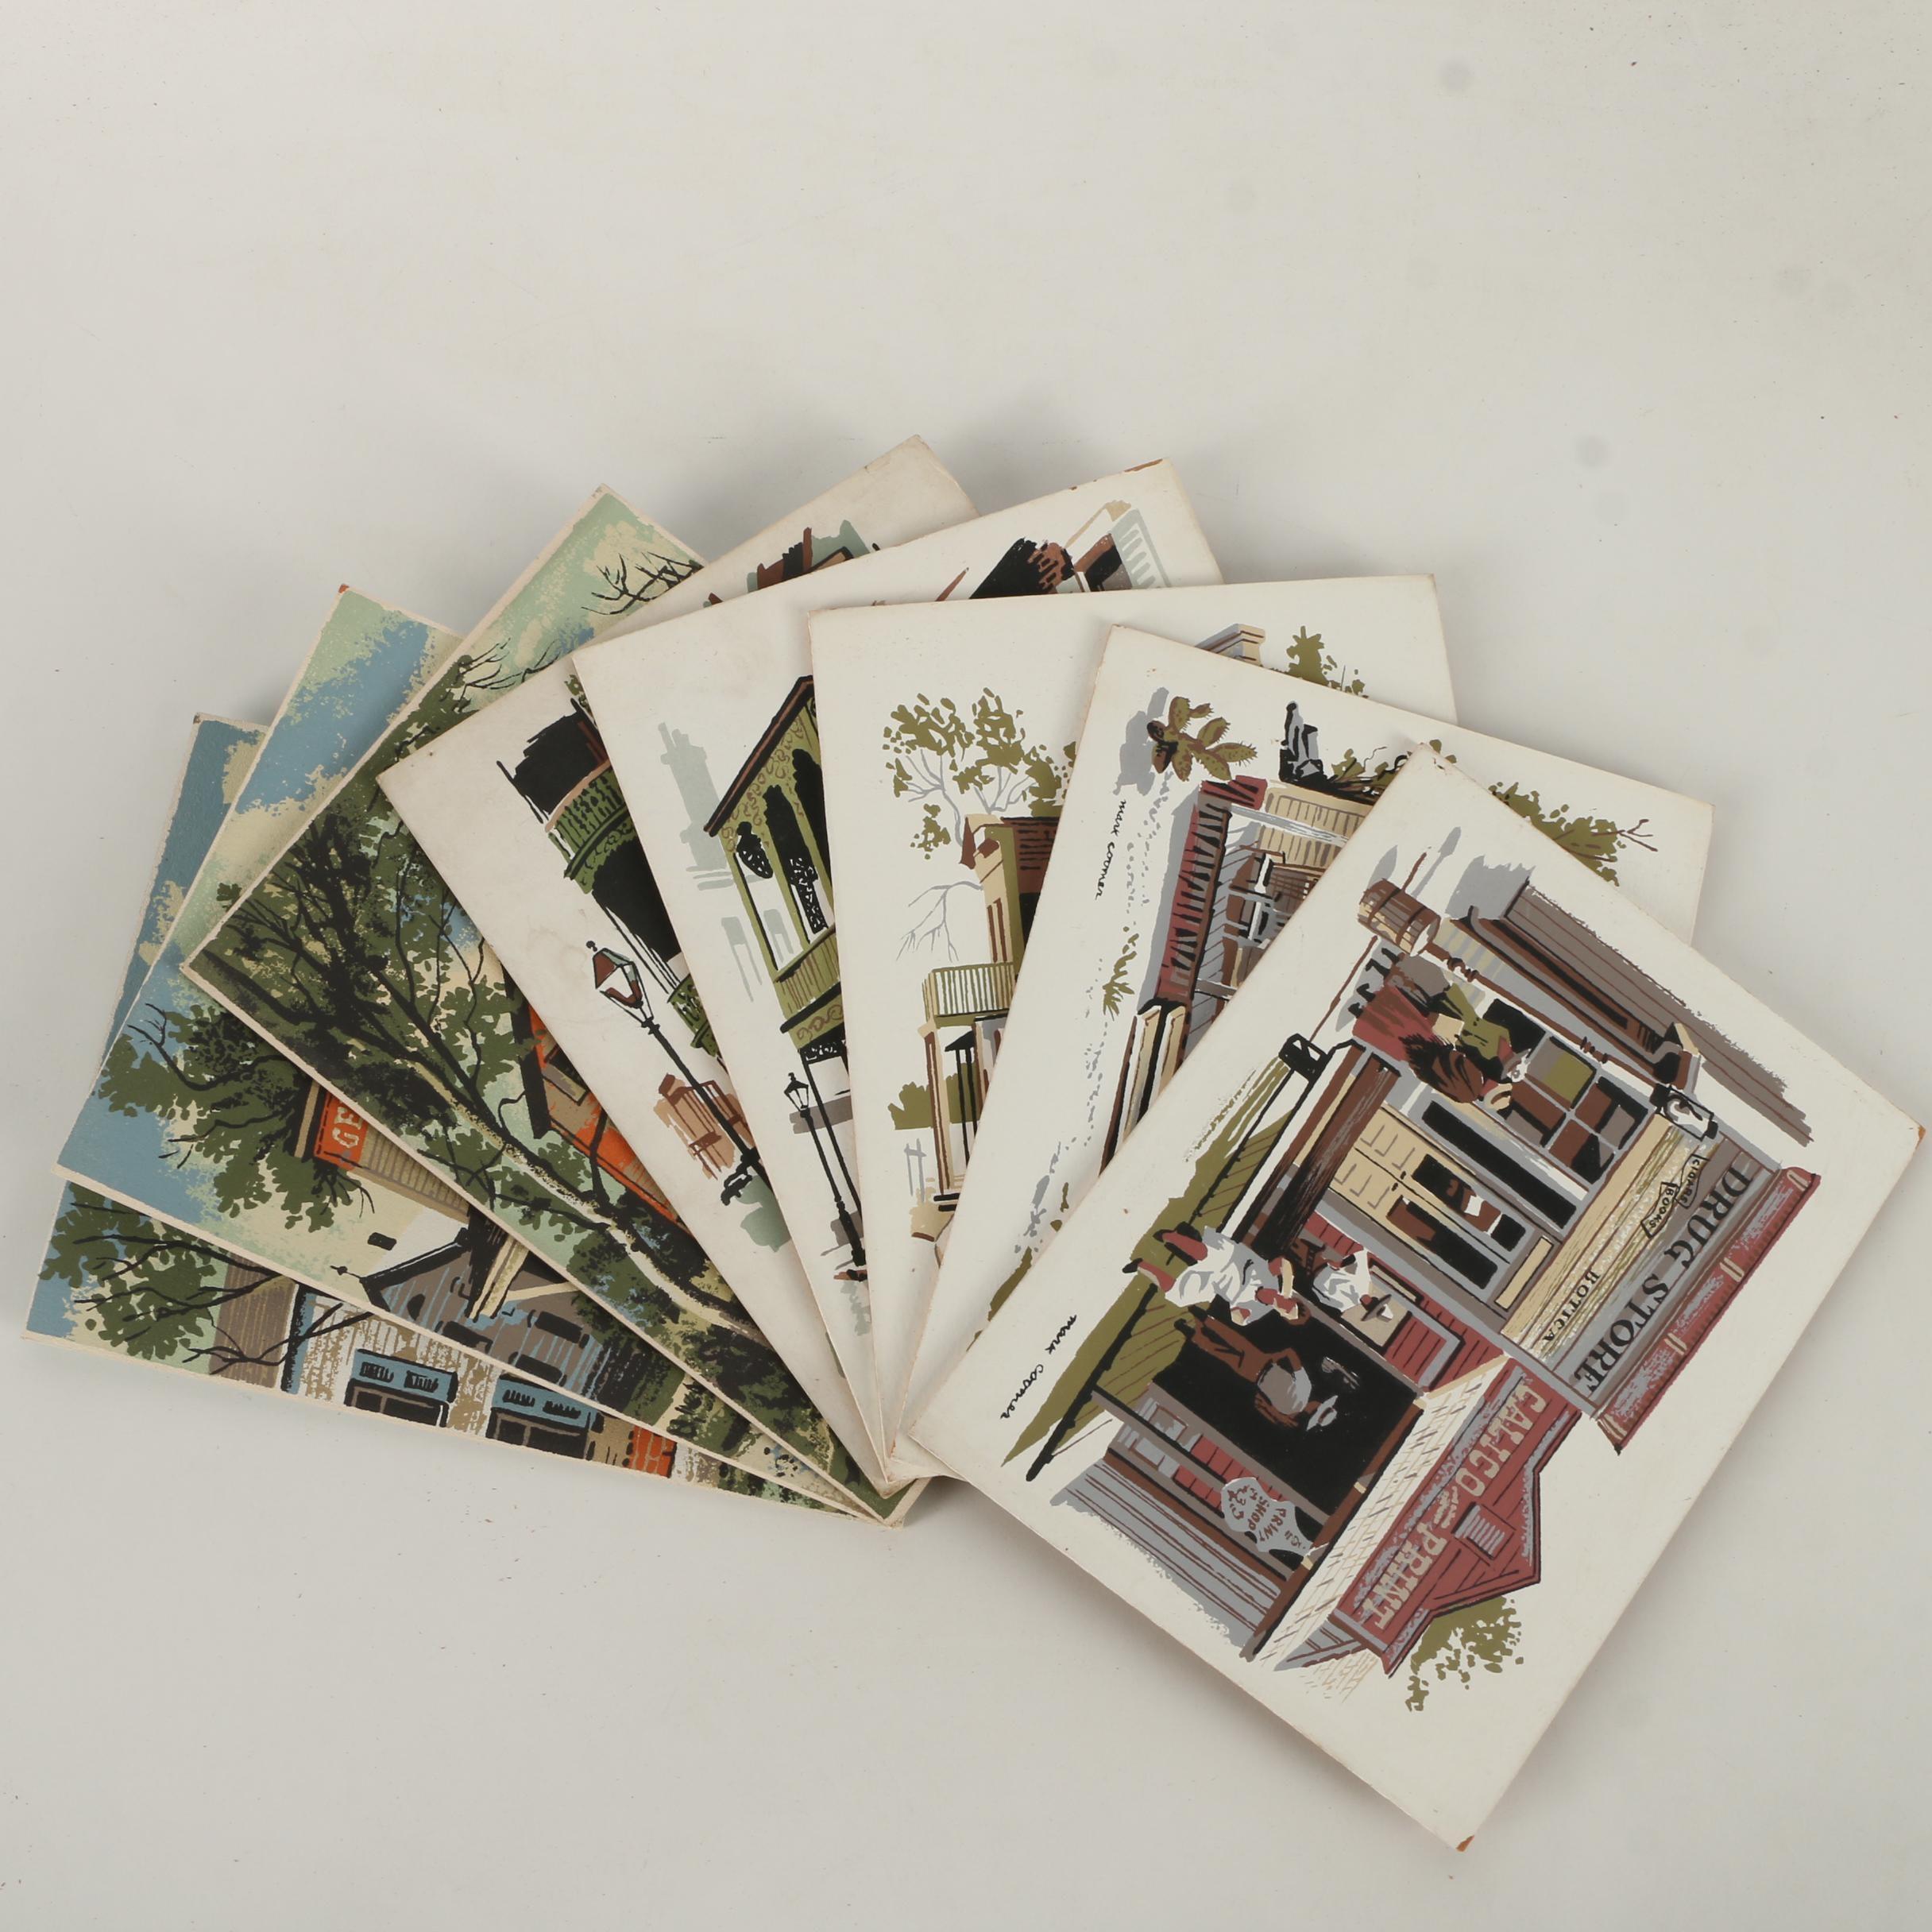 Mark Coomer Serigraphs of Western American Scenes